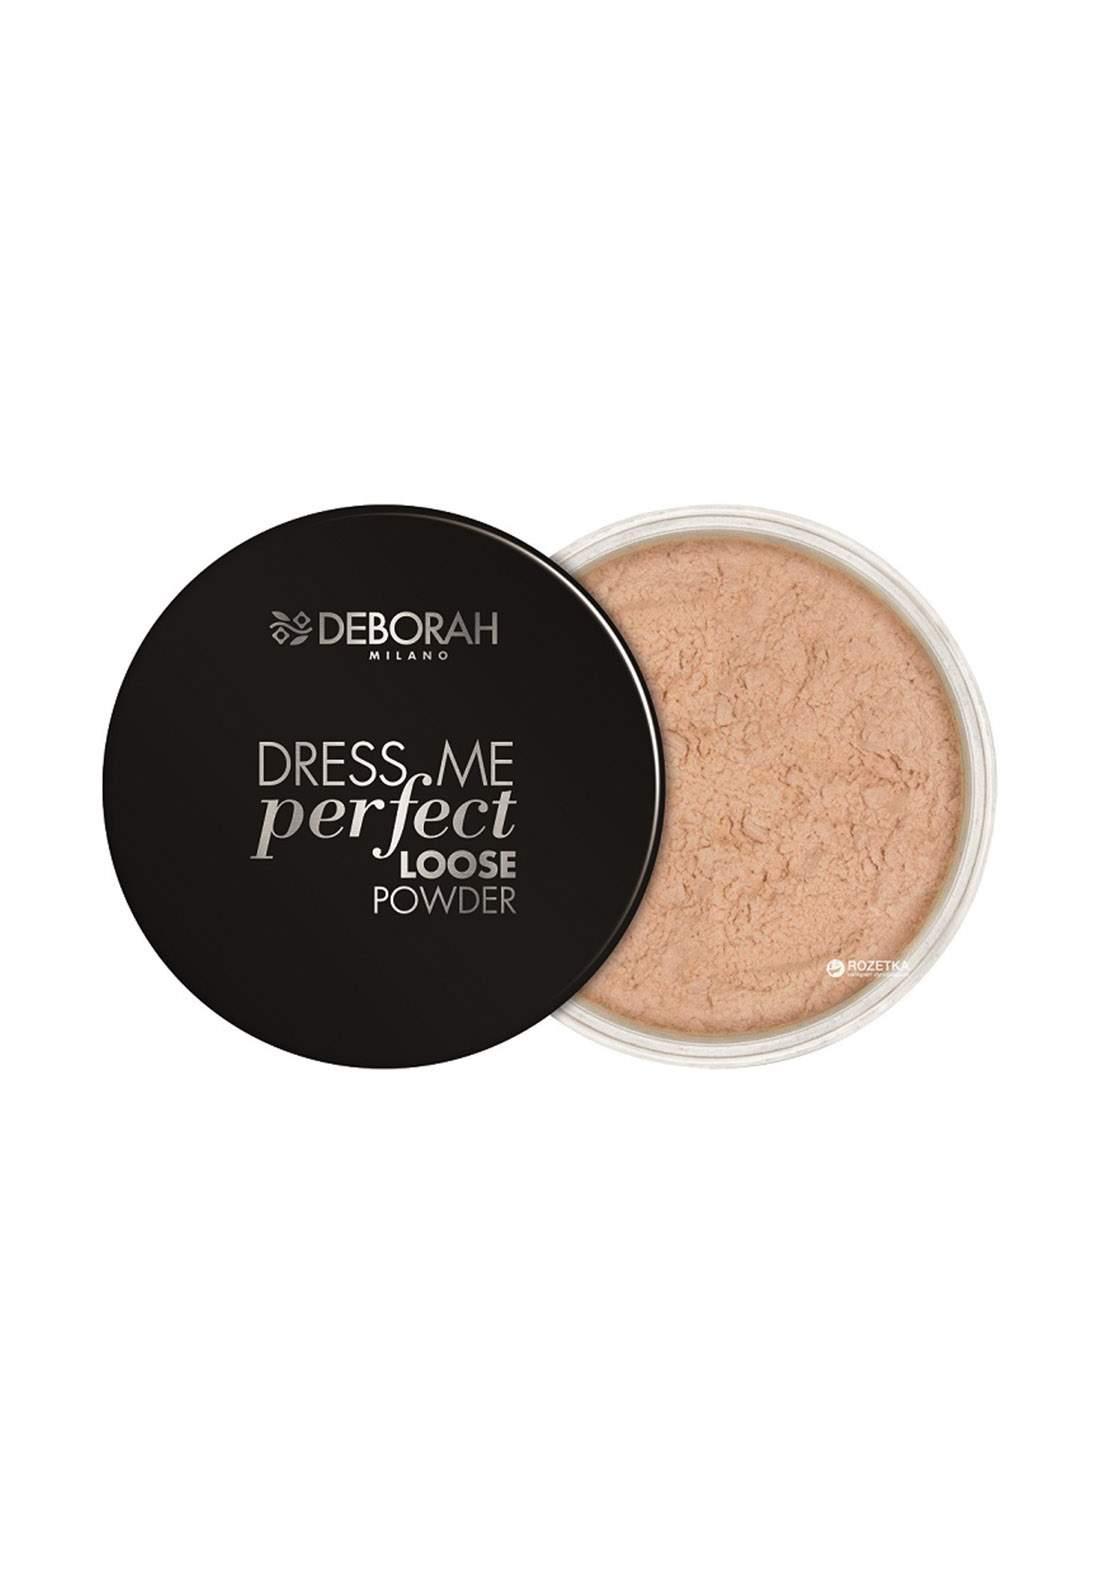 Deborah Milano Dress Me Perfect Loose Powder - Shade 00 بودرة